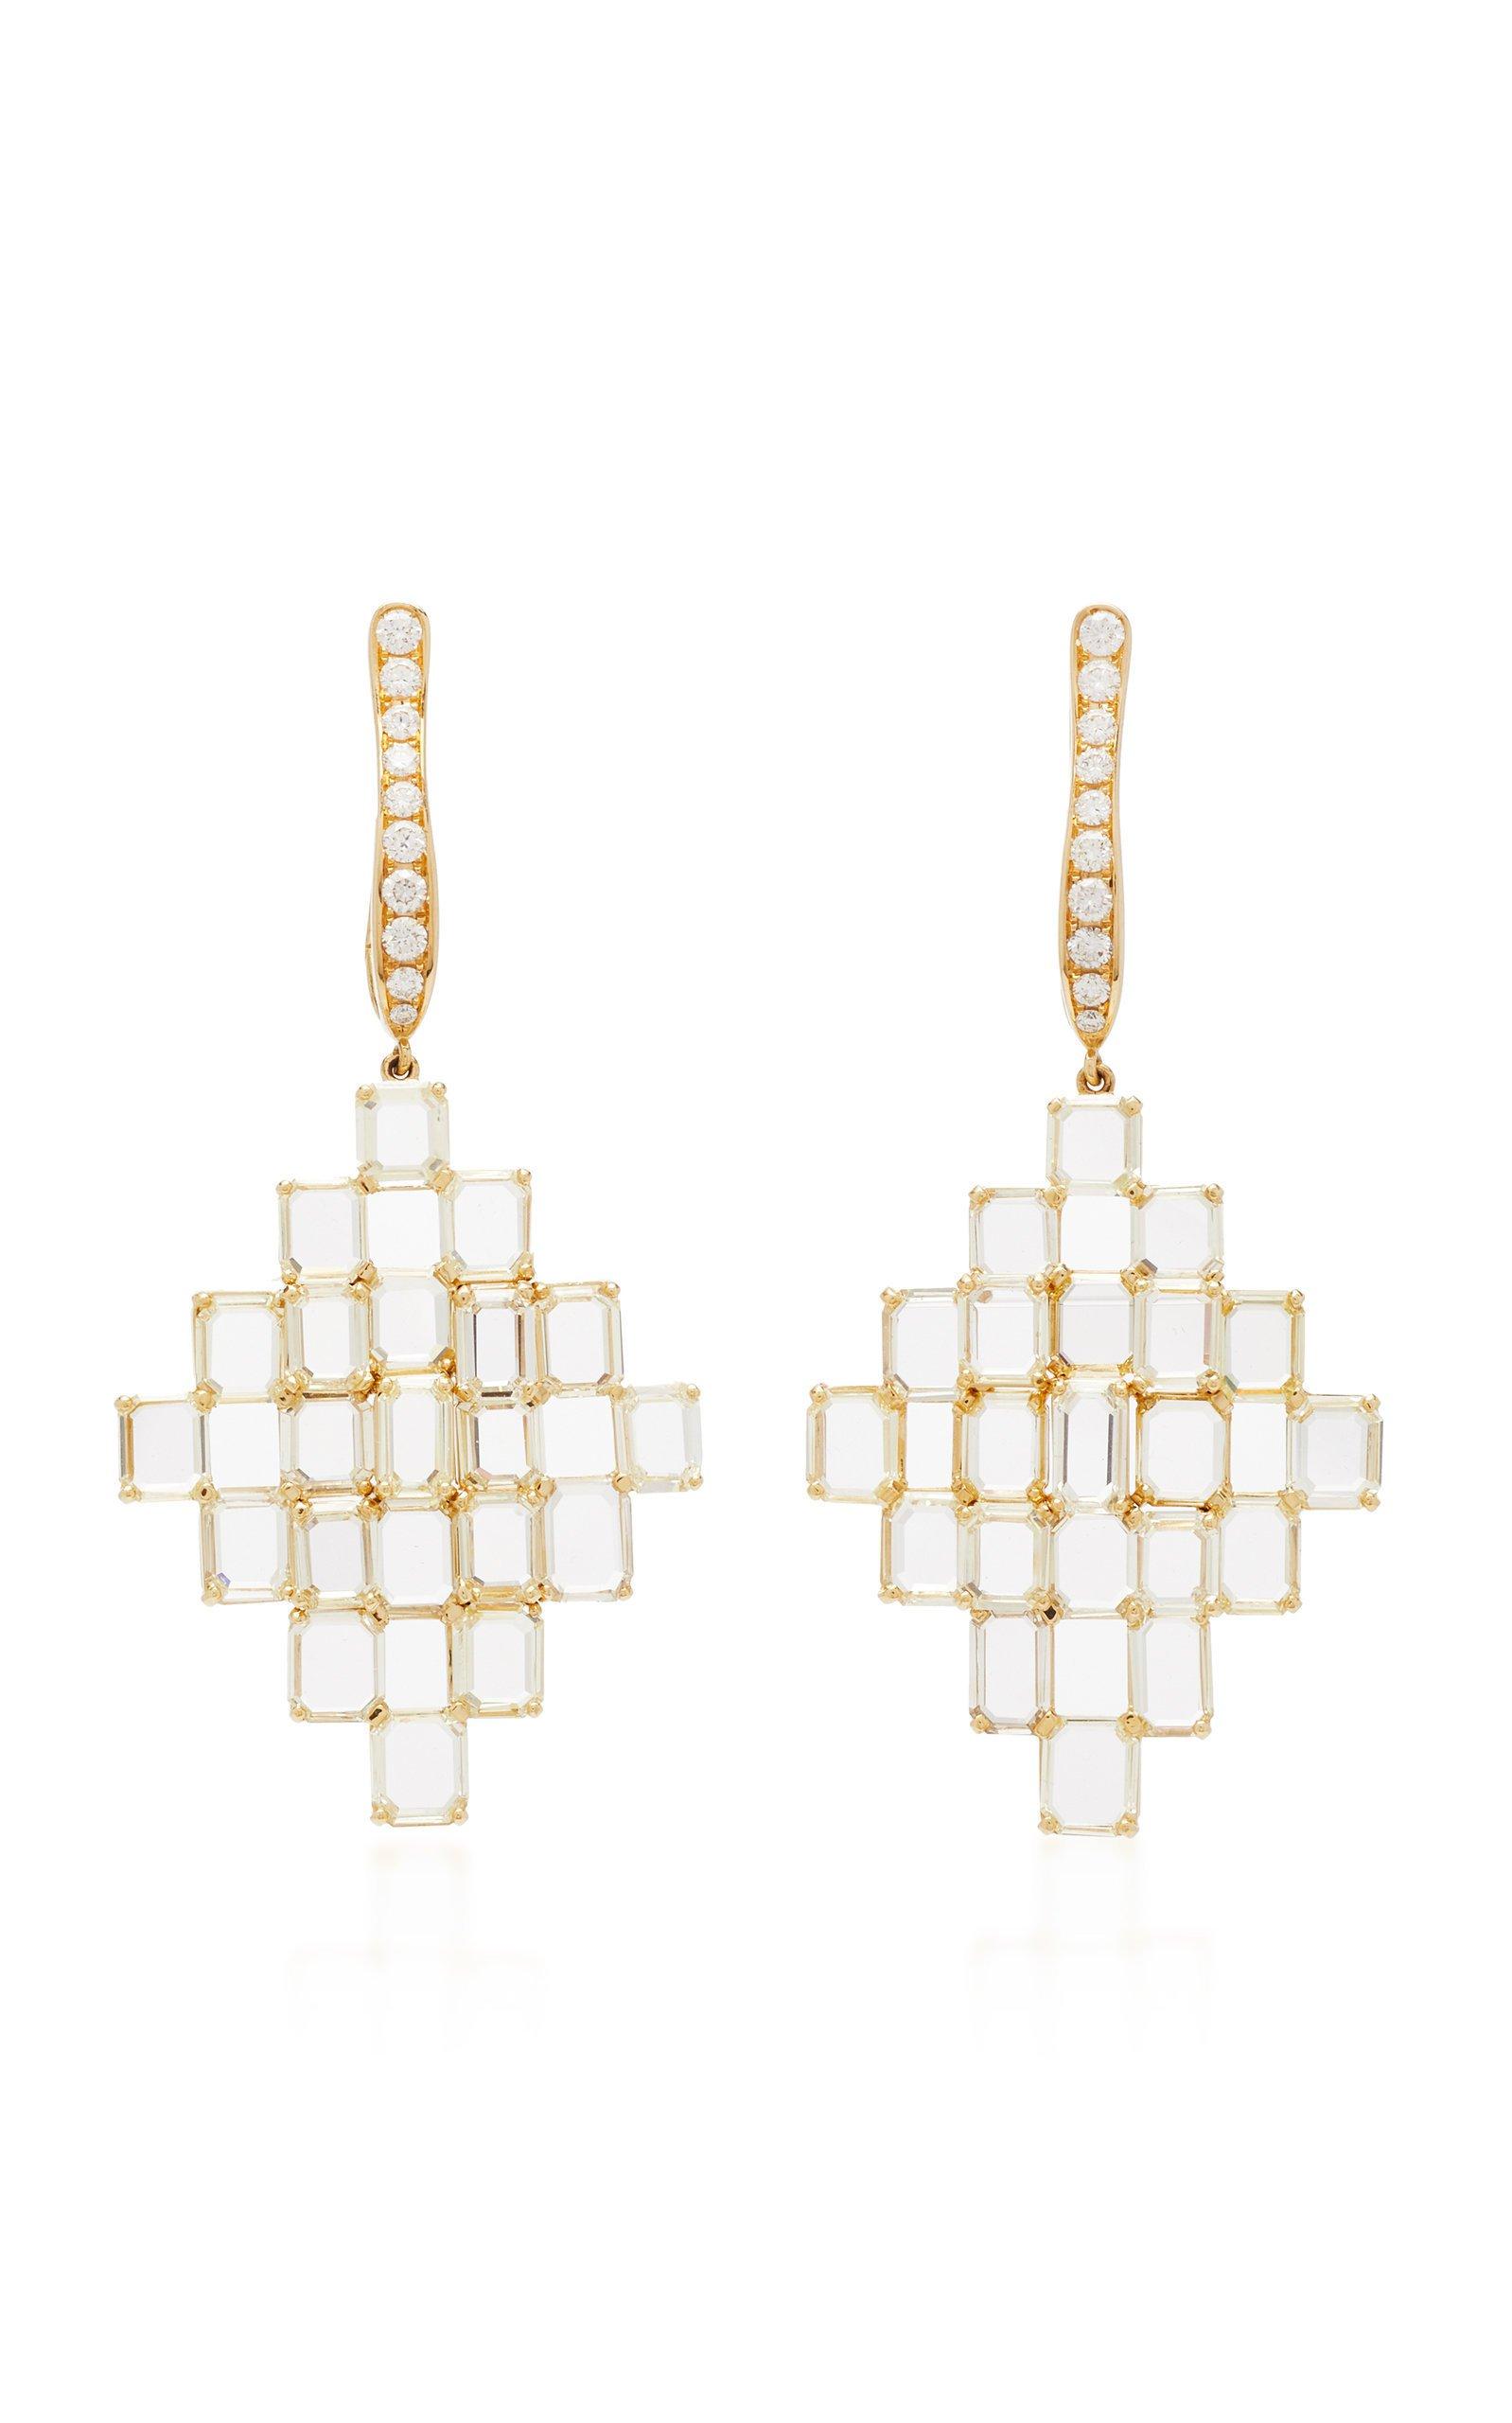 Busatti Shield 18K Gold and Diamond Earrings